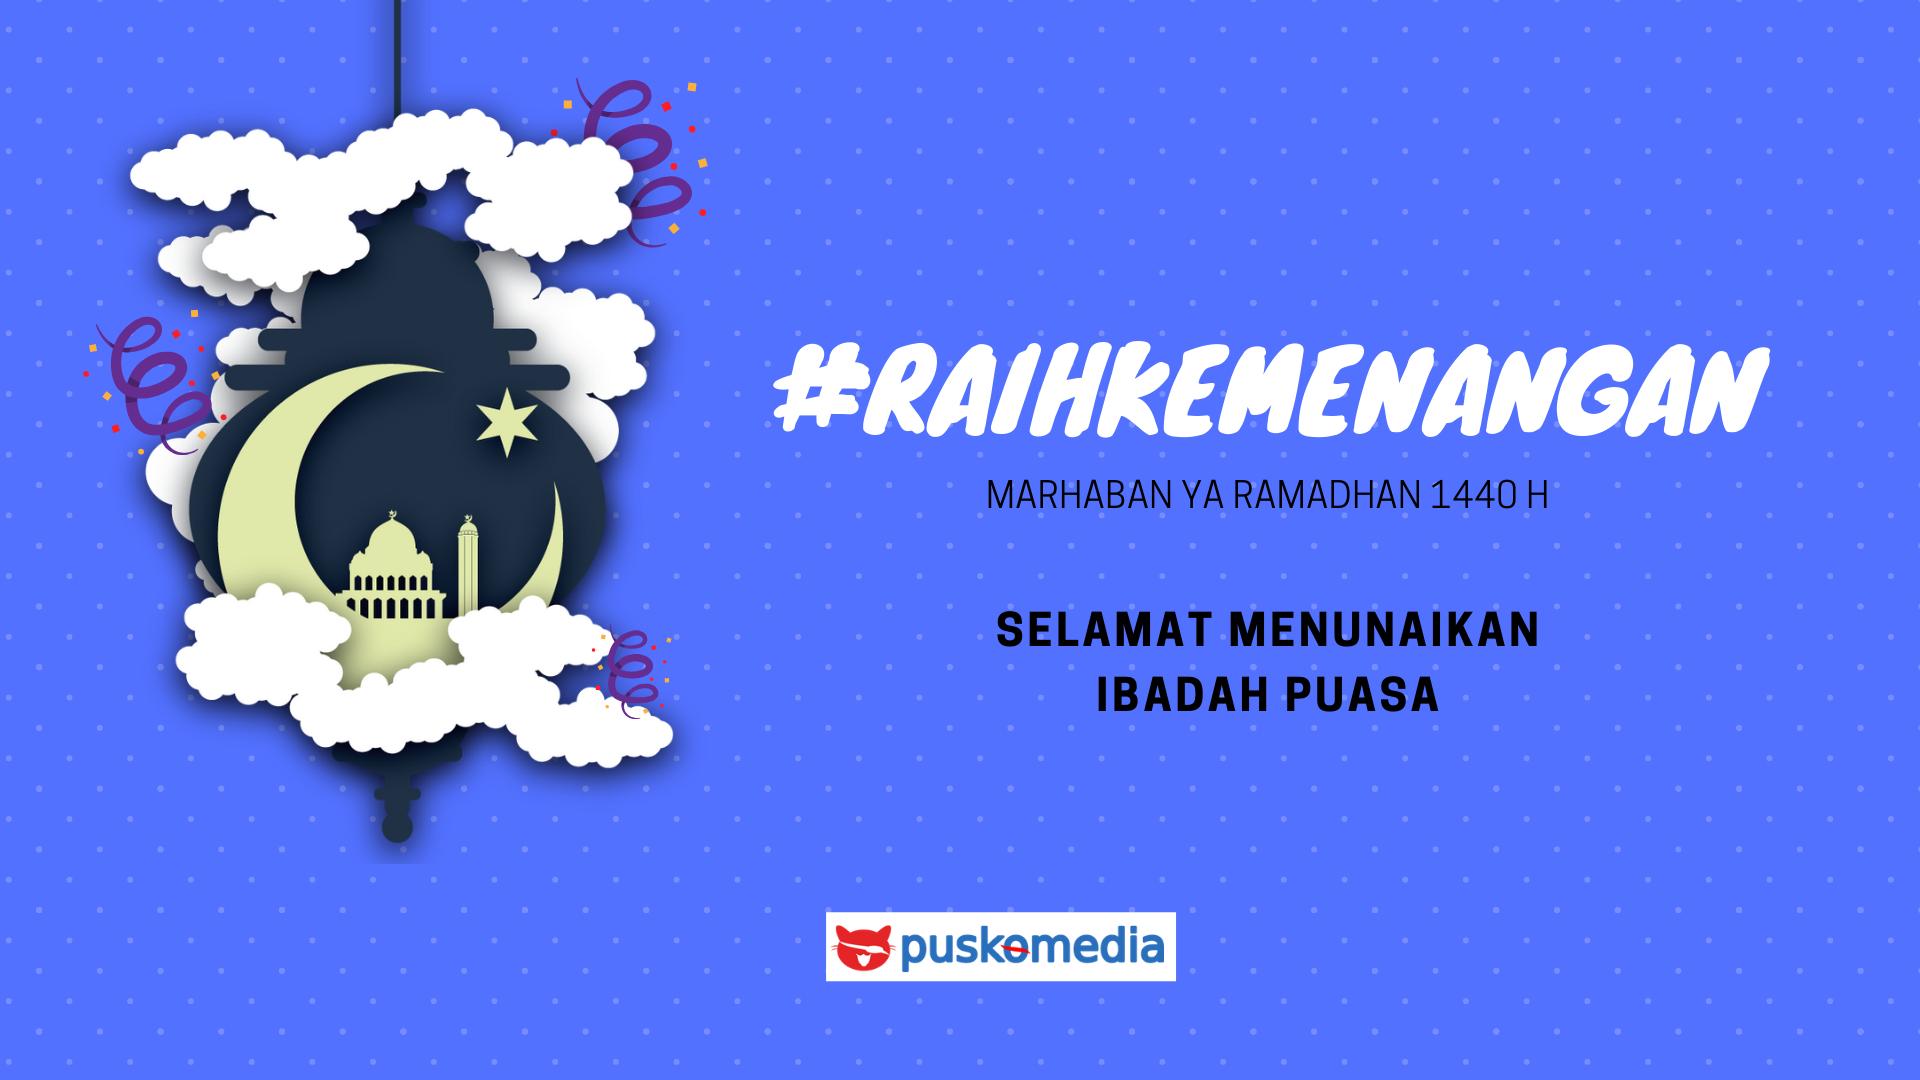 Ramadhan Puskomedia Indonesia